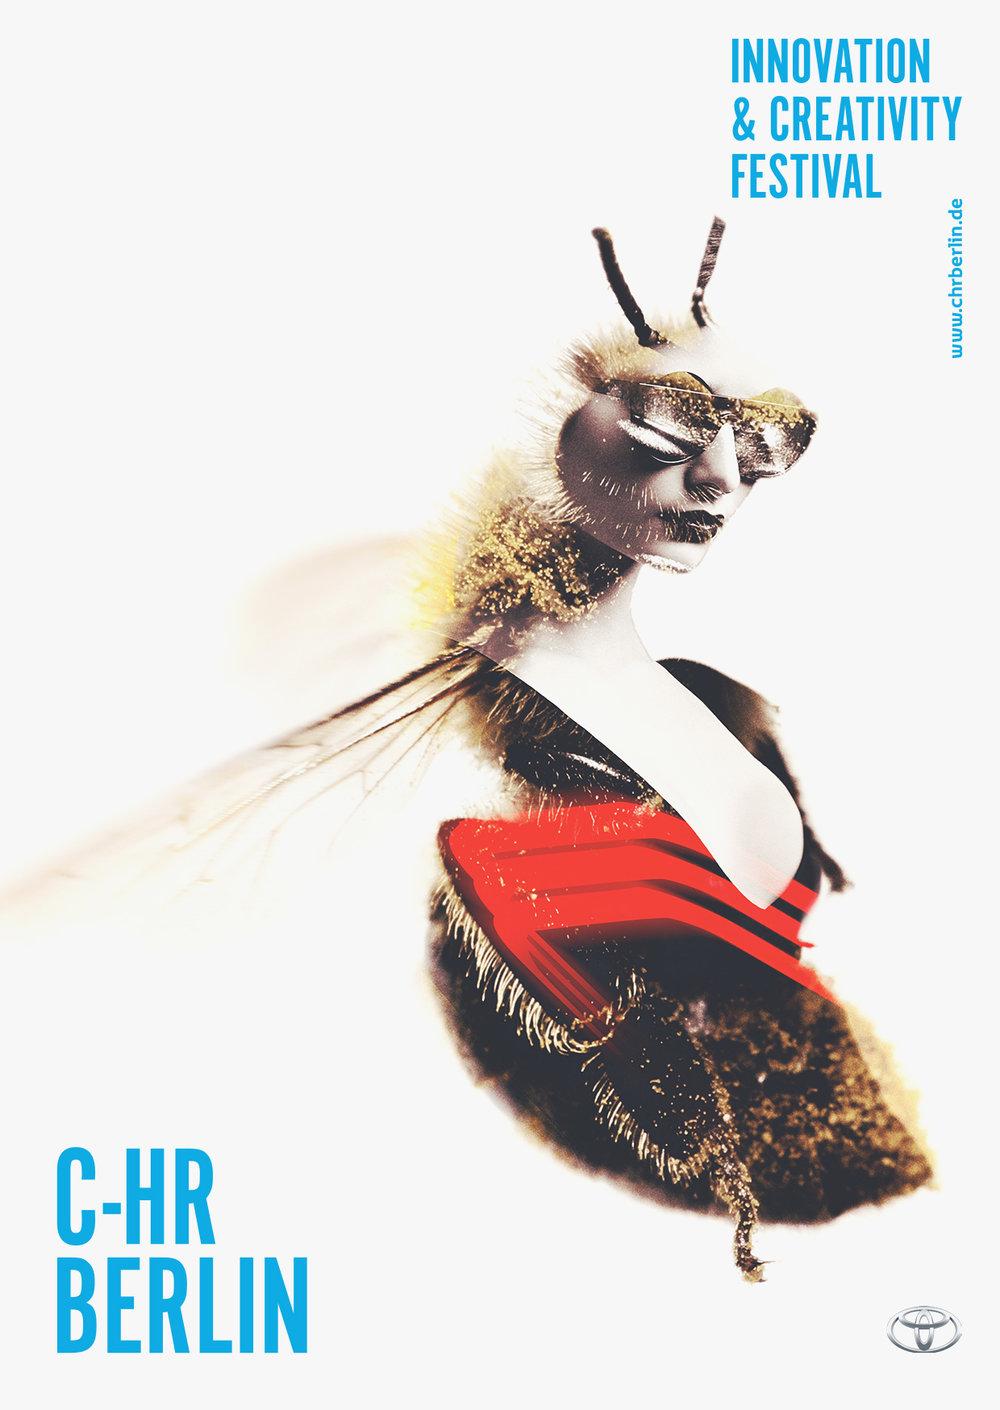 C-HR_BERLIN_A6_Postcards_1-2.jpg